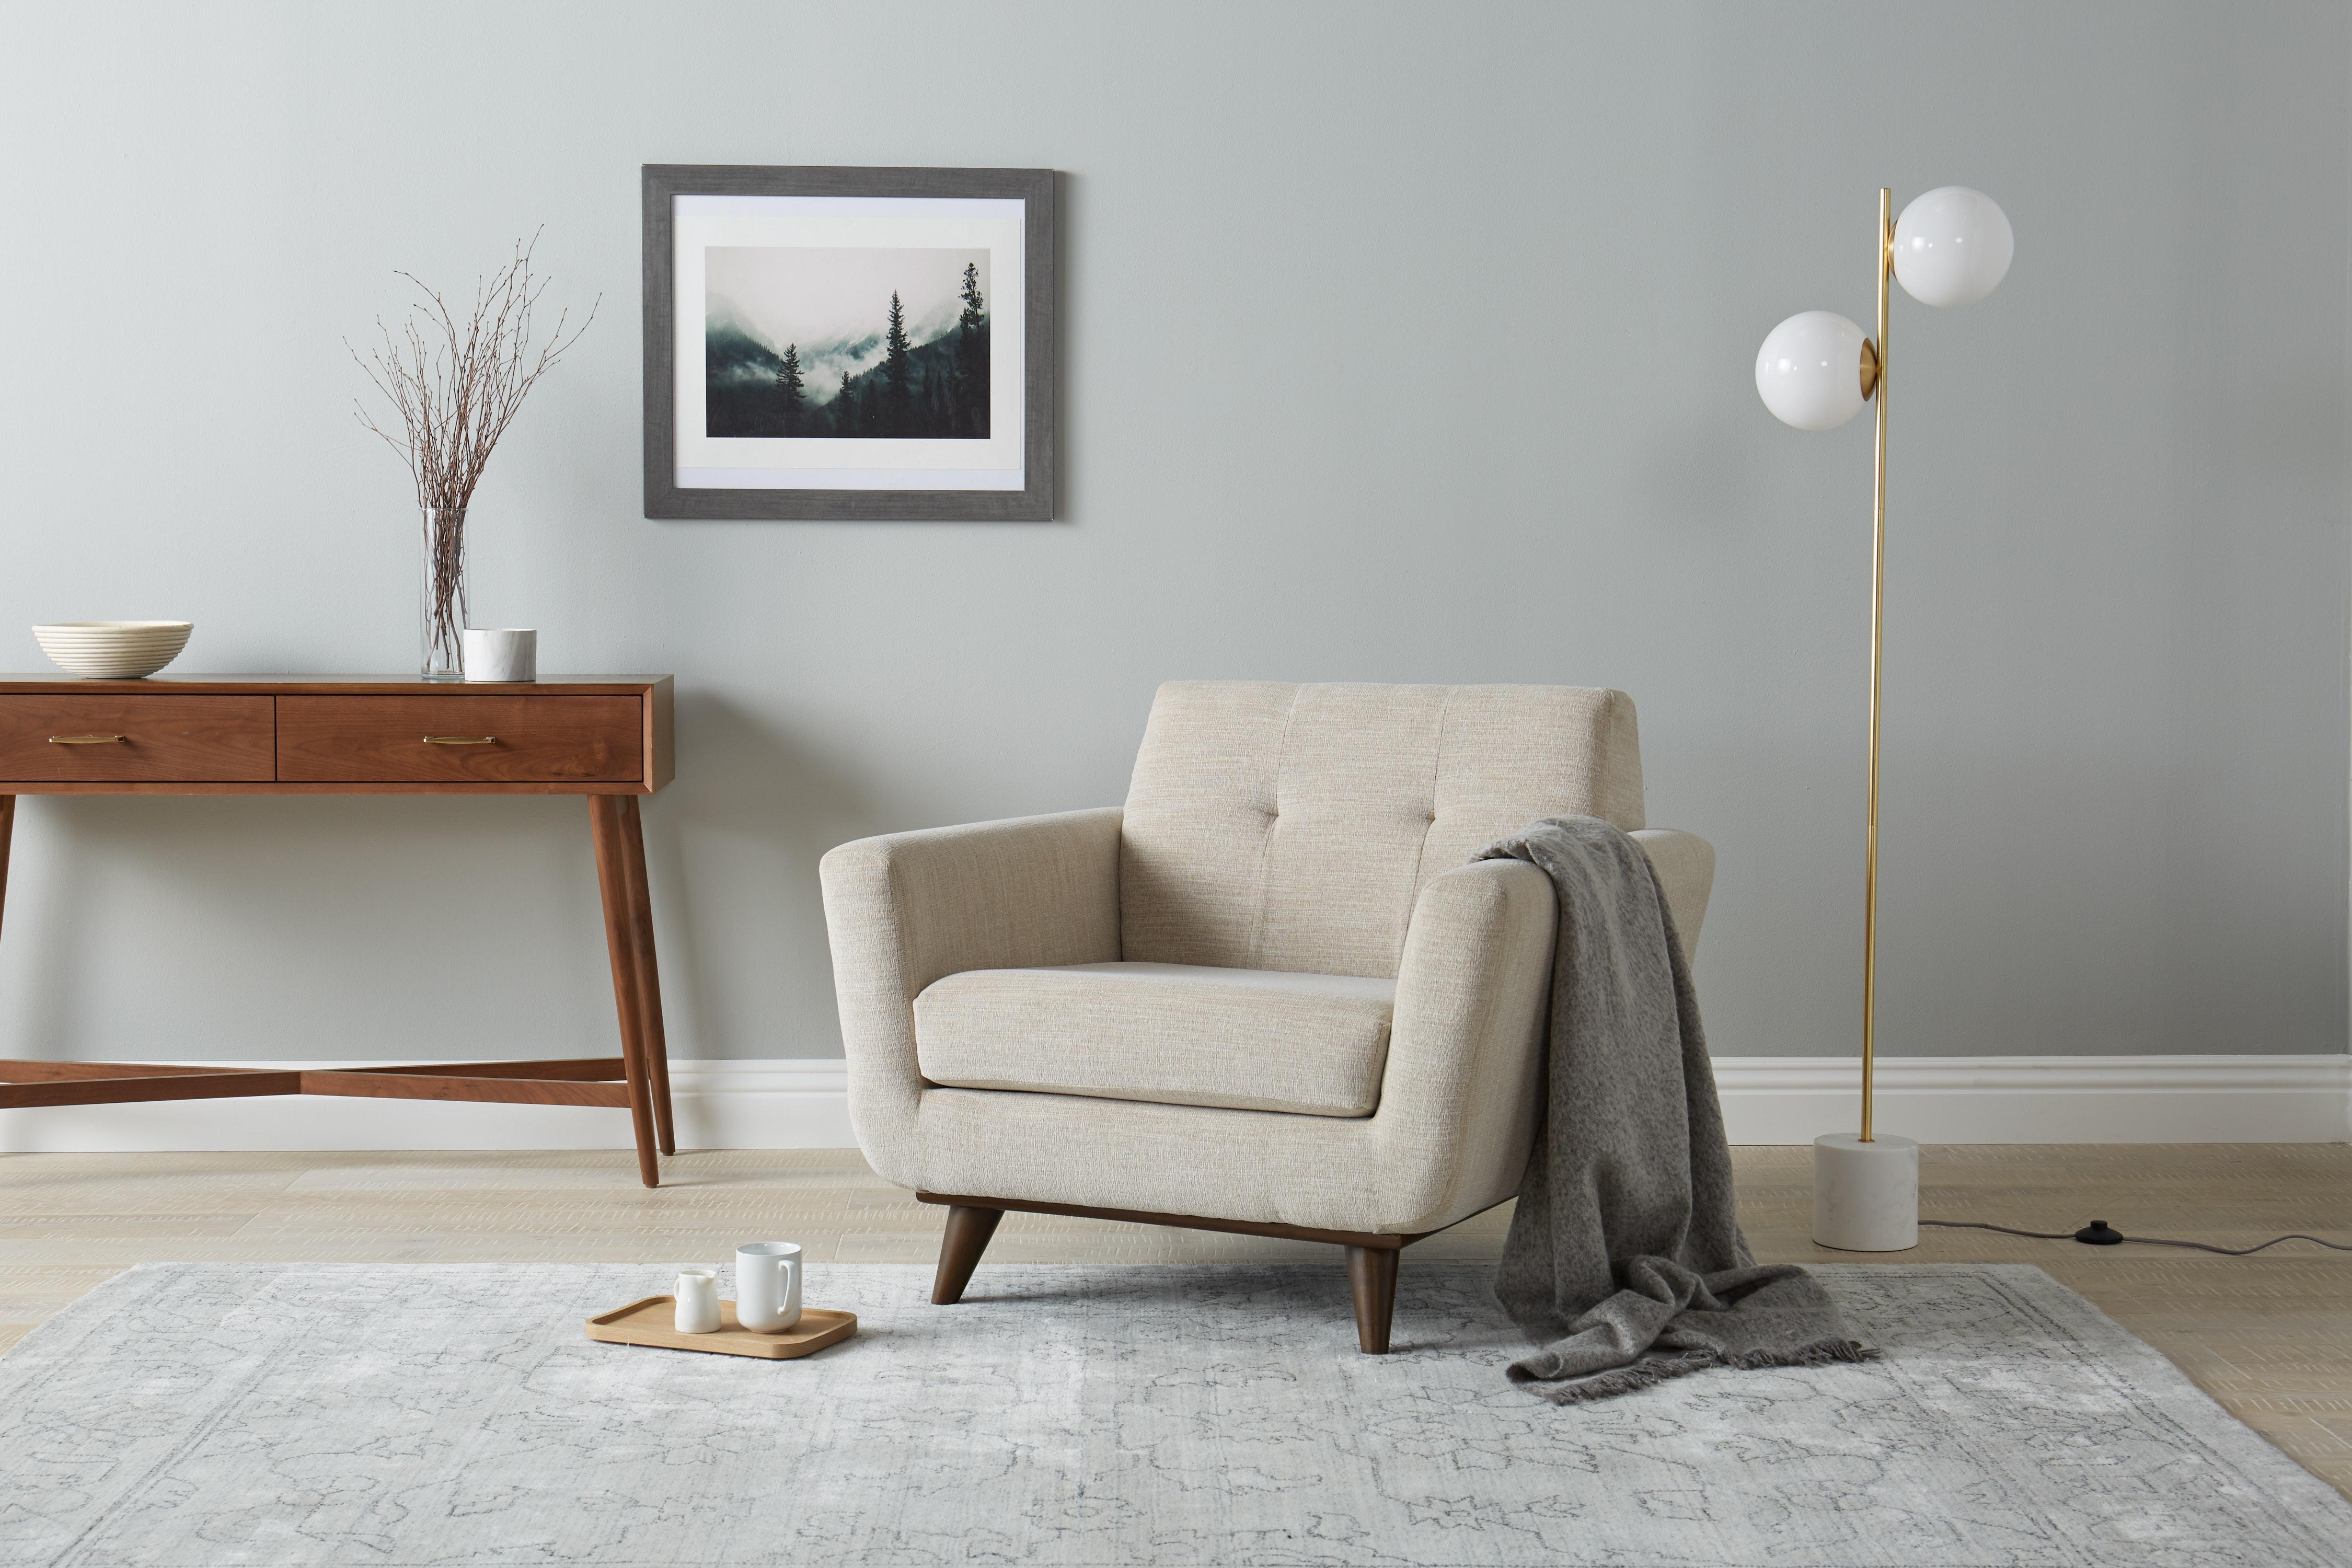 Astonishing Furniture Mid Century Modern Upholstered Soild Wooden Accent Ibusinesslaw Wood Chair Design Ideas Ibusinesslaworg